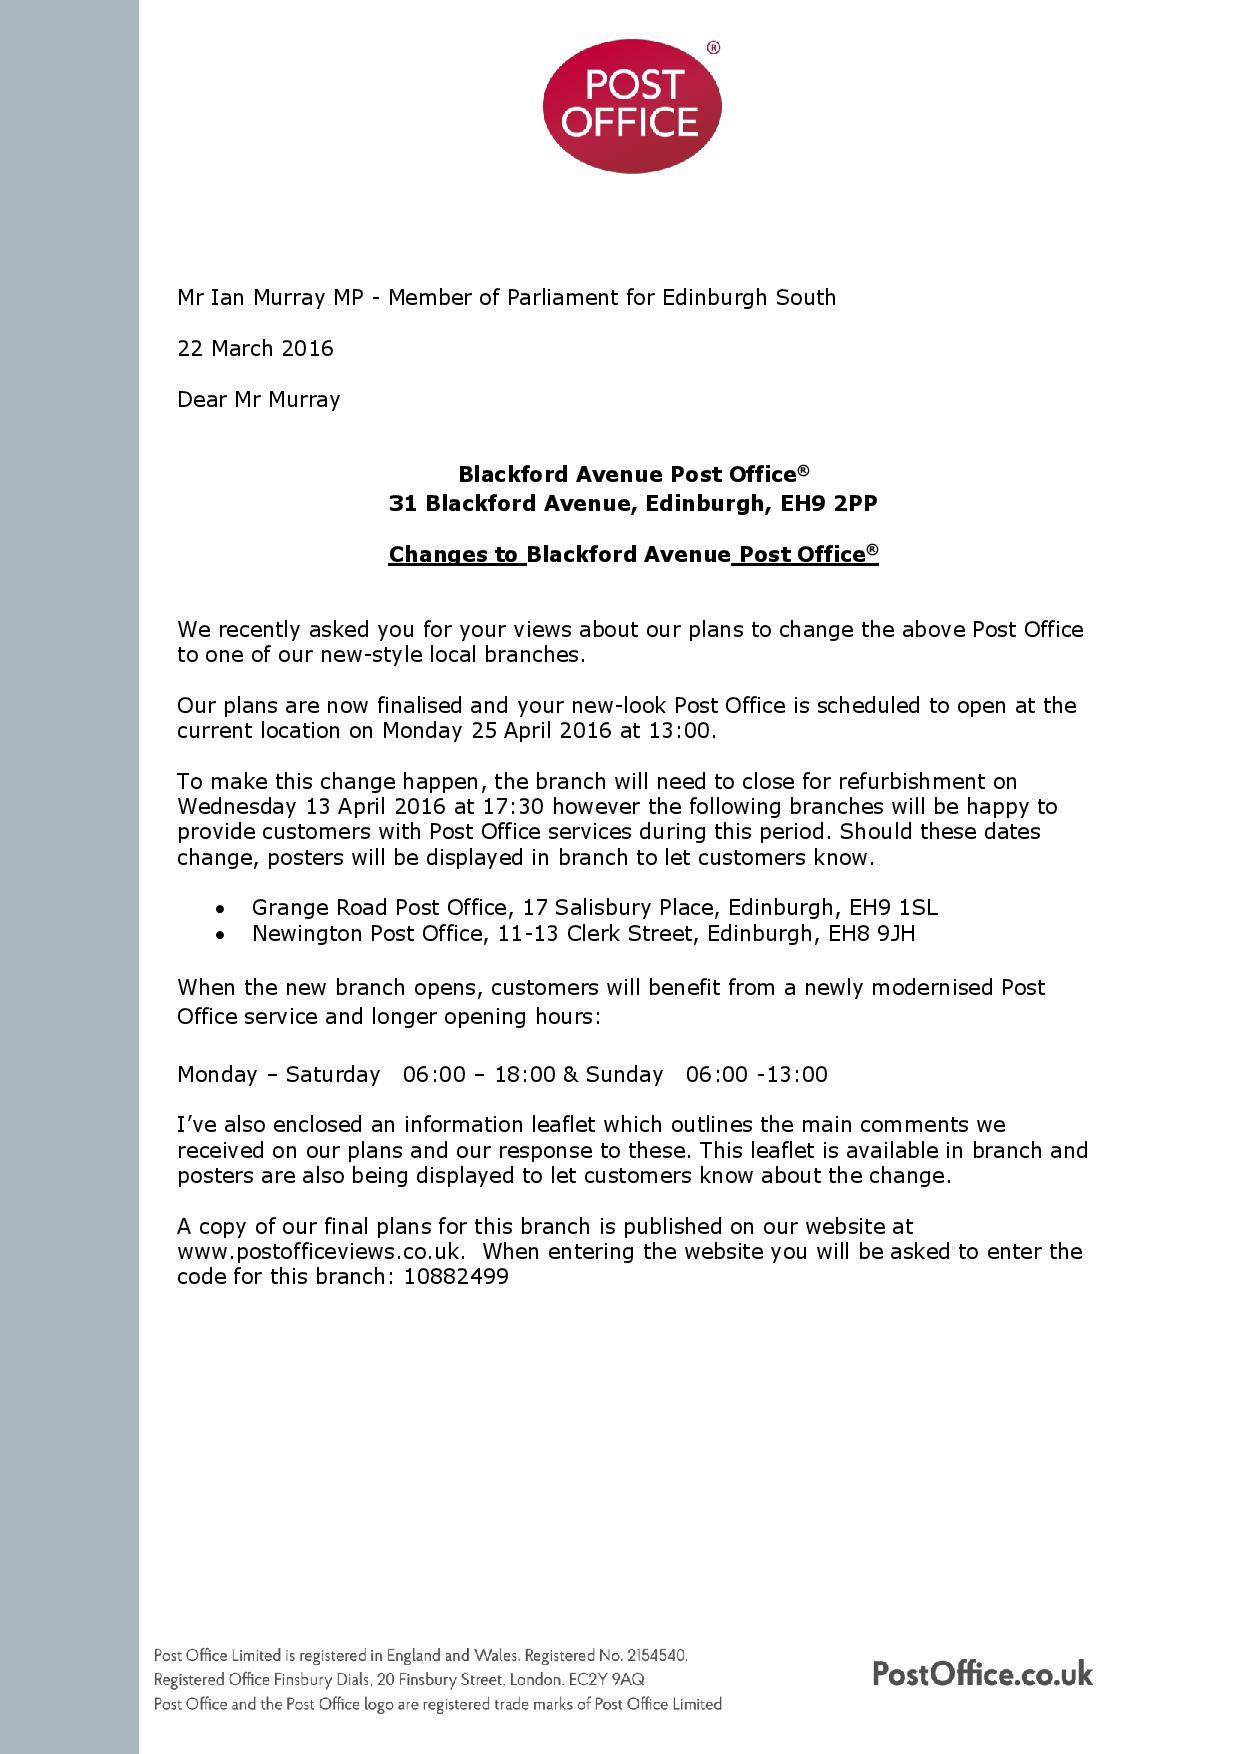 Blackford_Avenue_-_EH9_2PP_-_Mr_Ian_Murray_MP_Letter-page-001.jpg